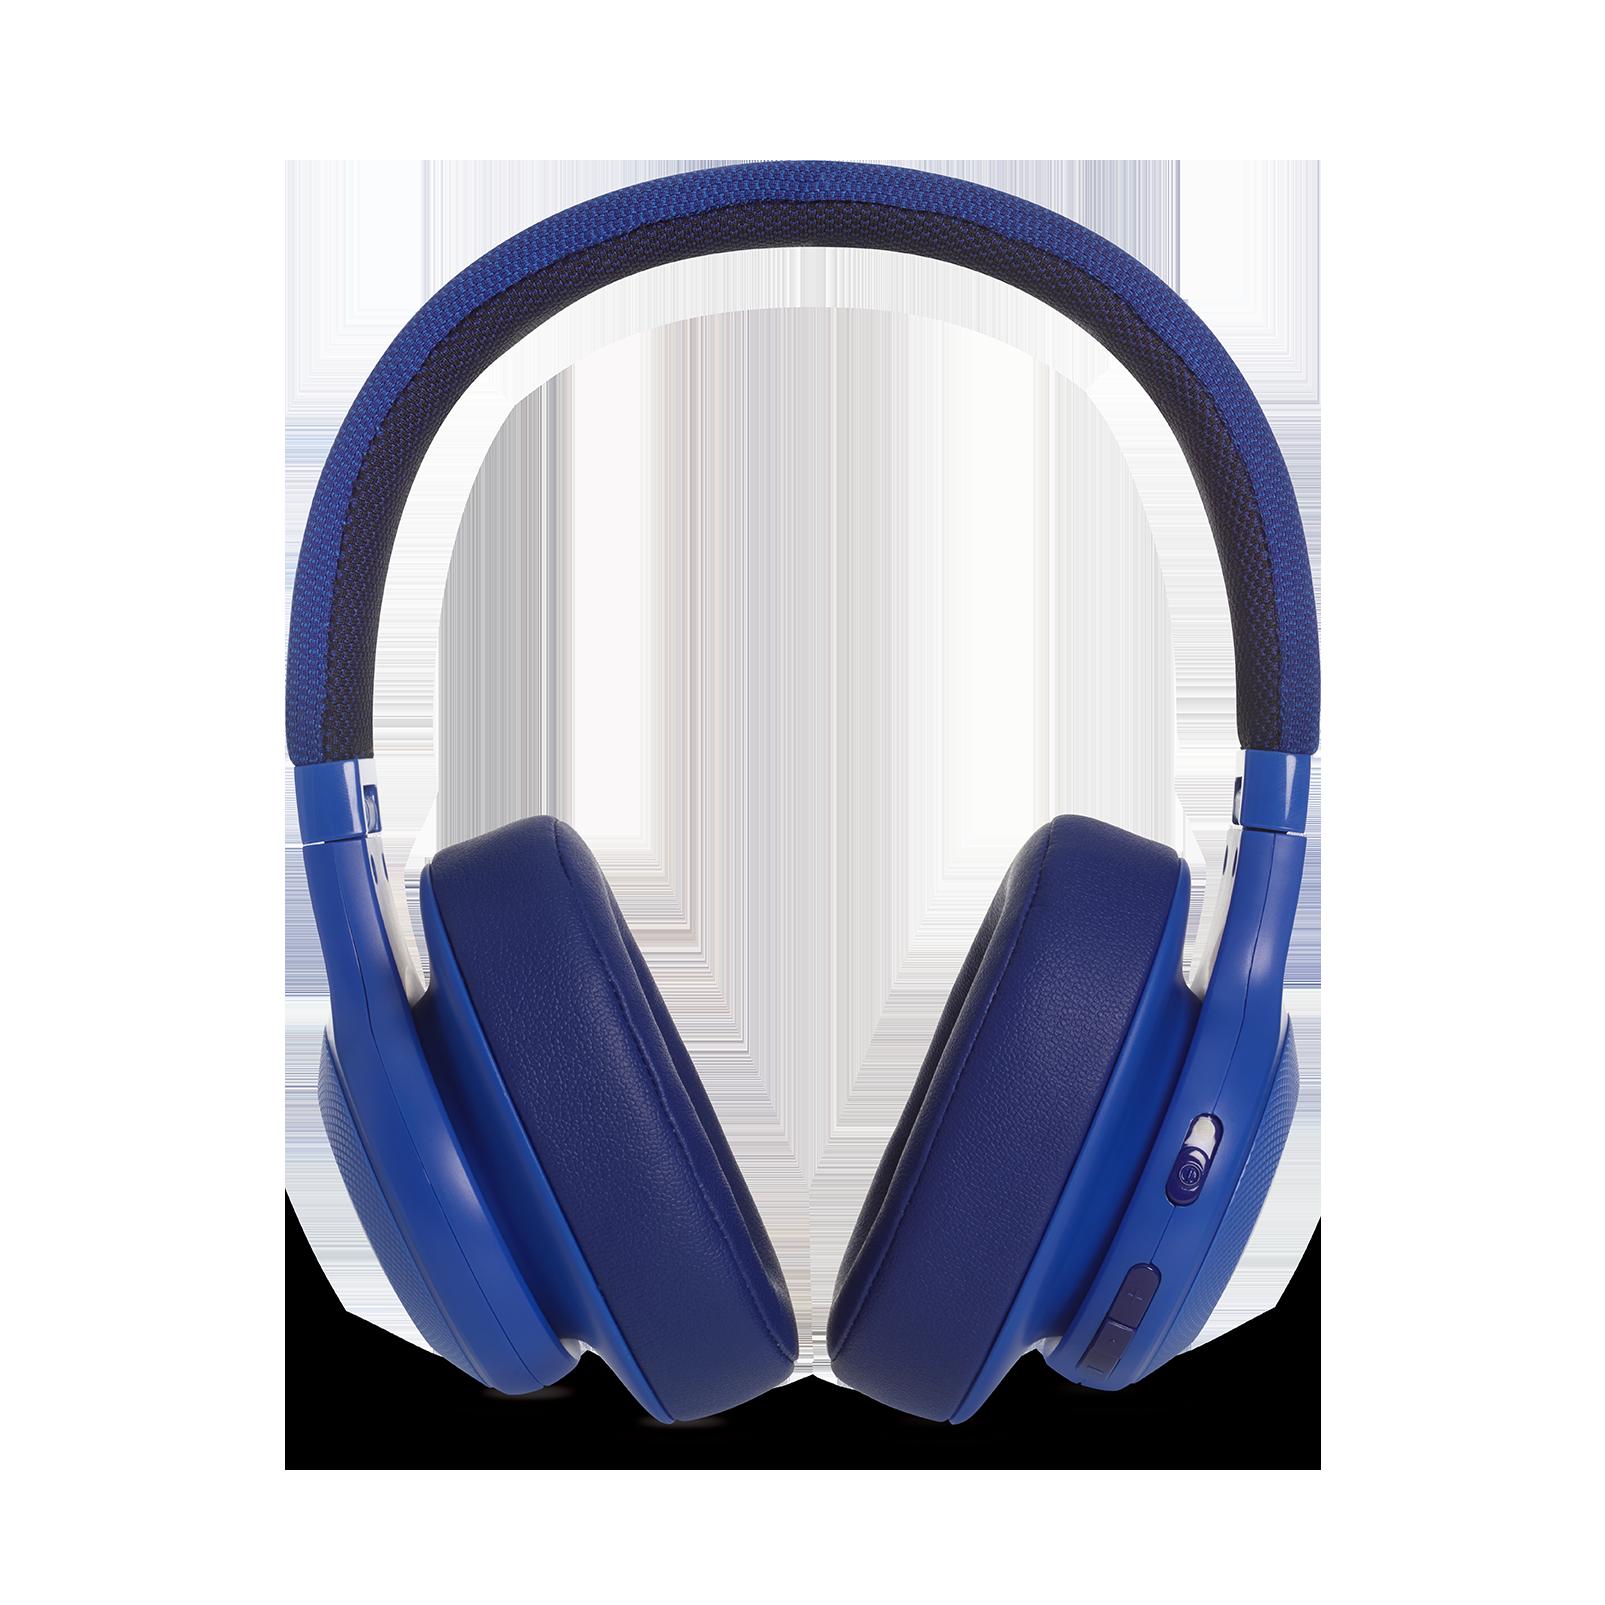 JBL E55BT - Blue - Wireless over-ear headphones - Detailshot 4